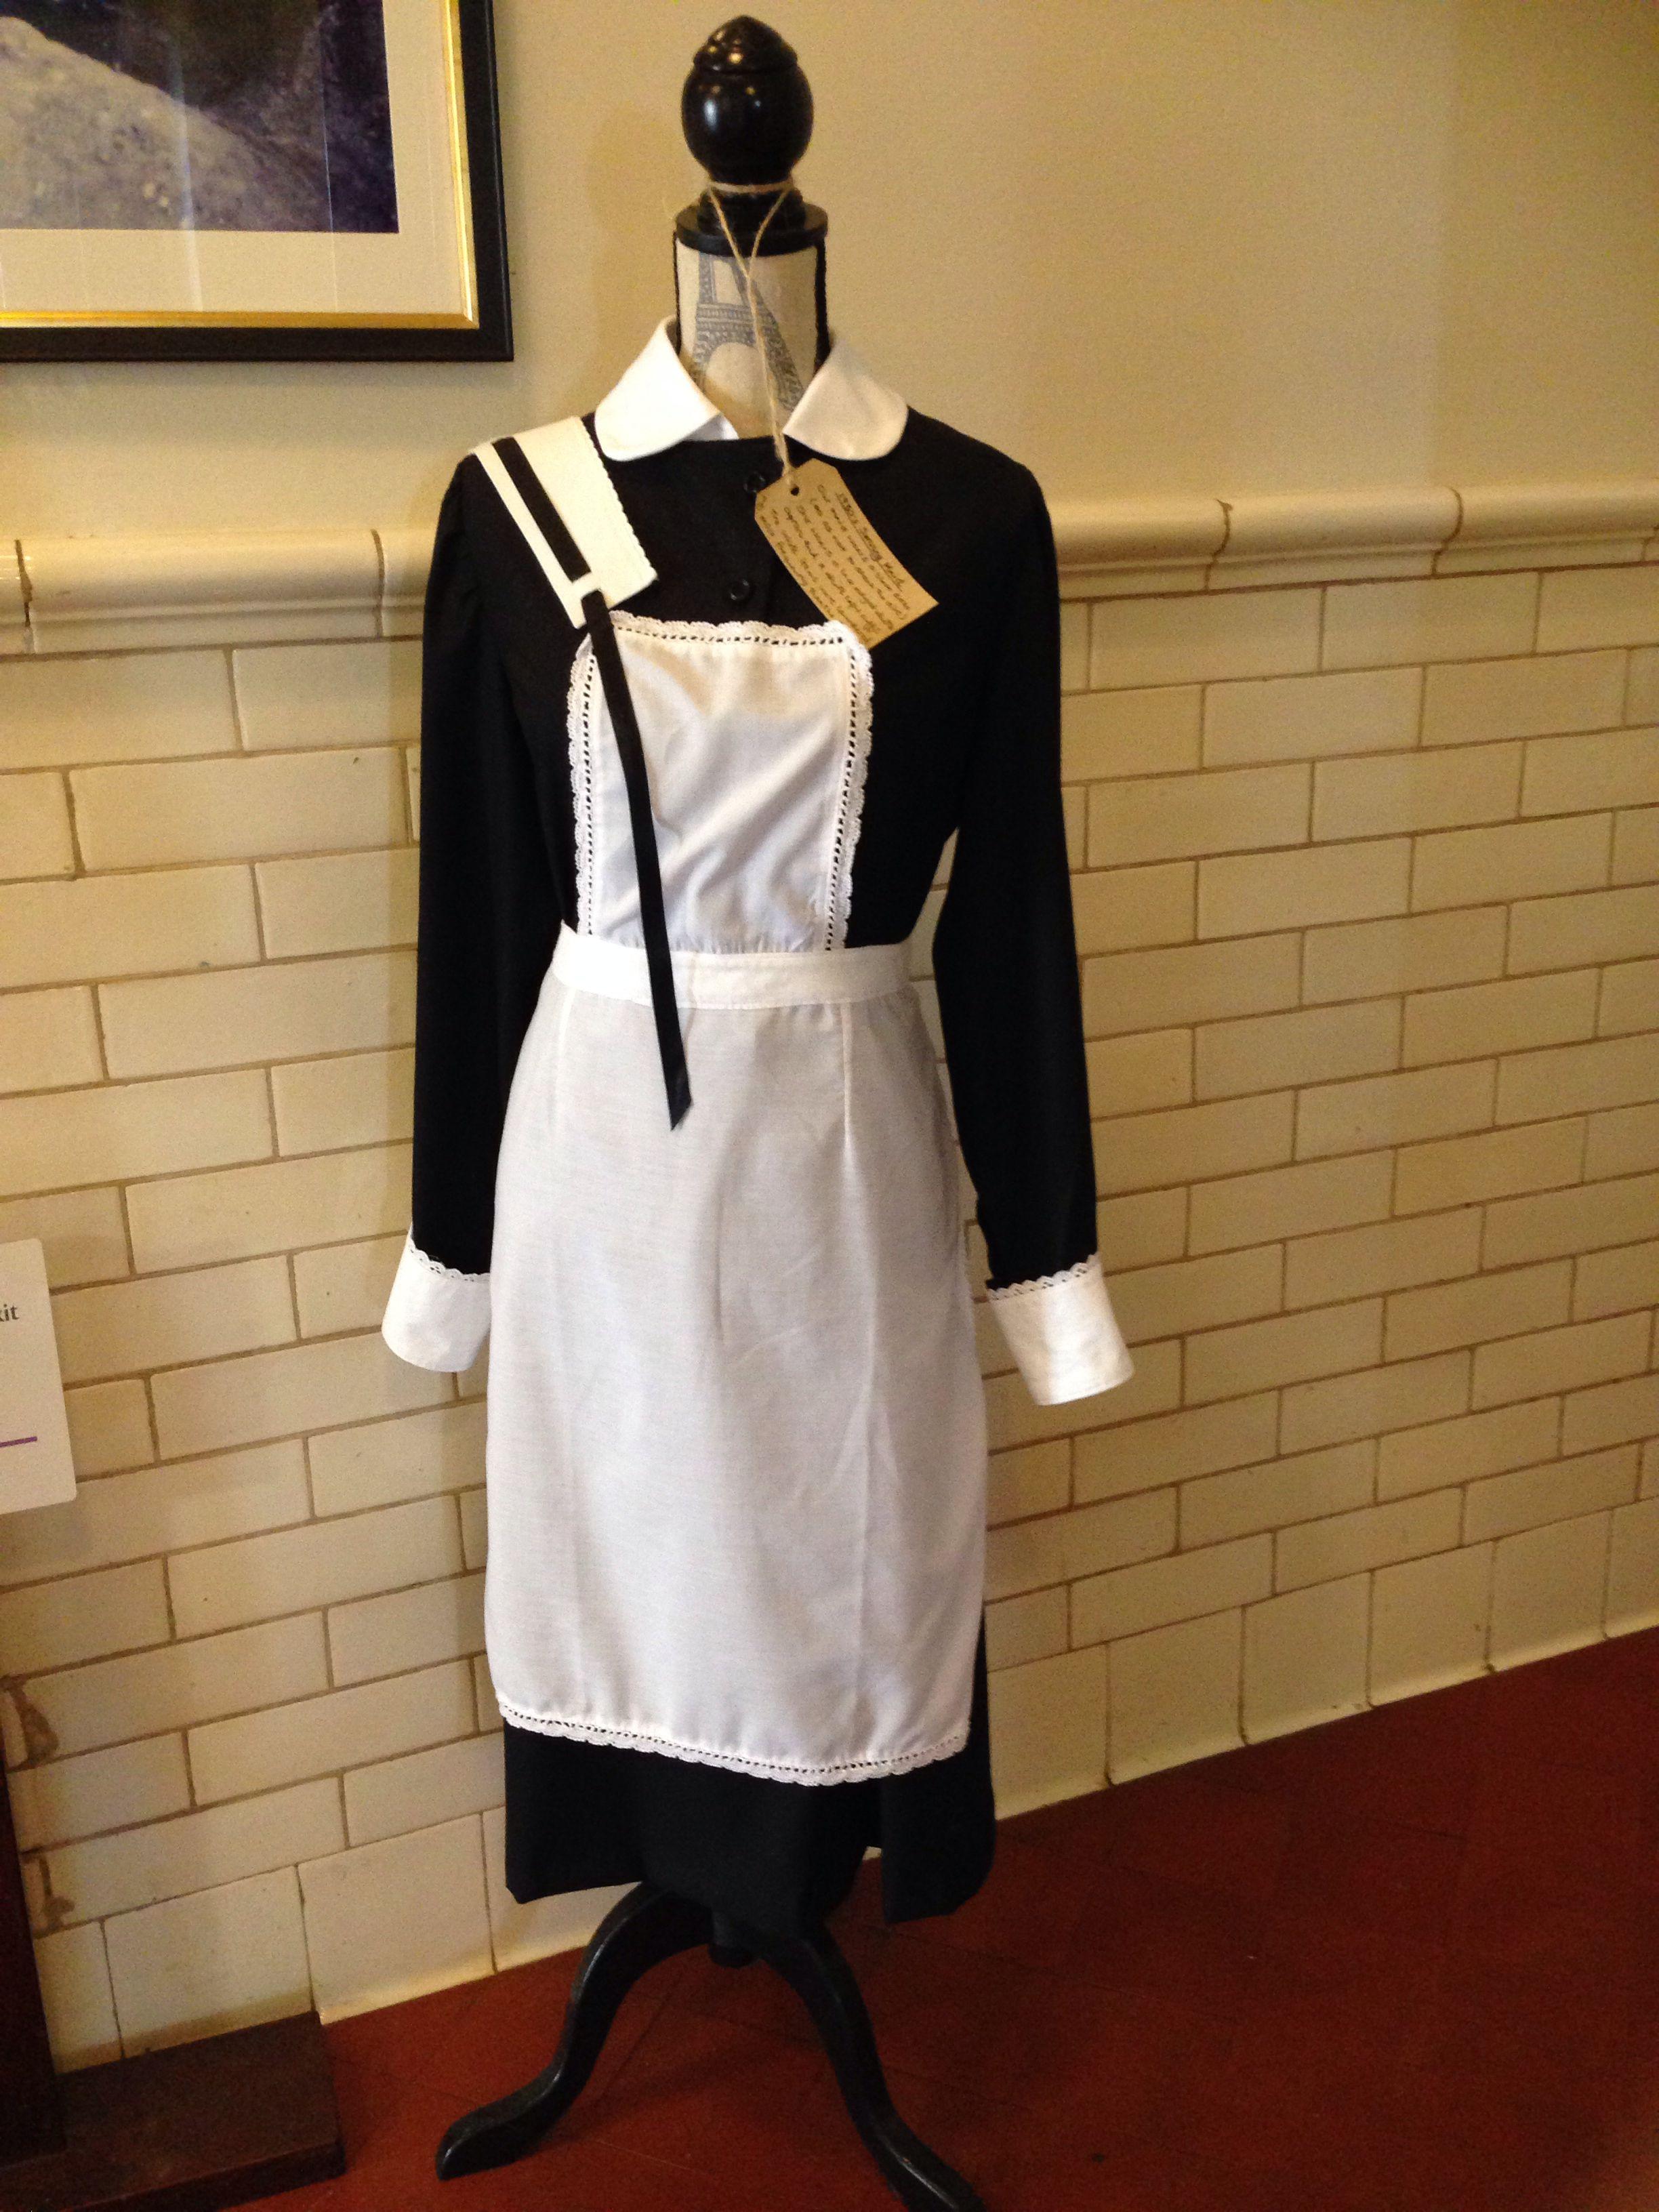 26+ Maids uniform dress ideas in 2021